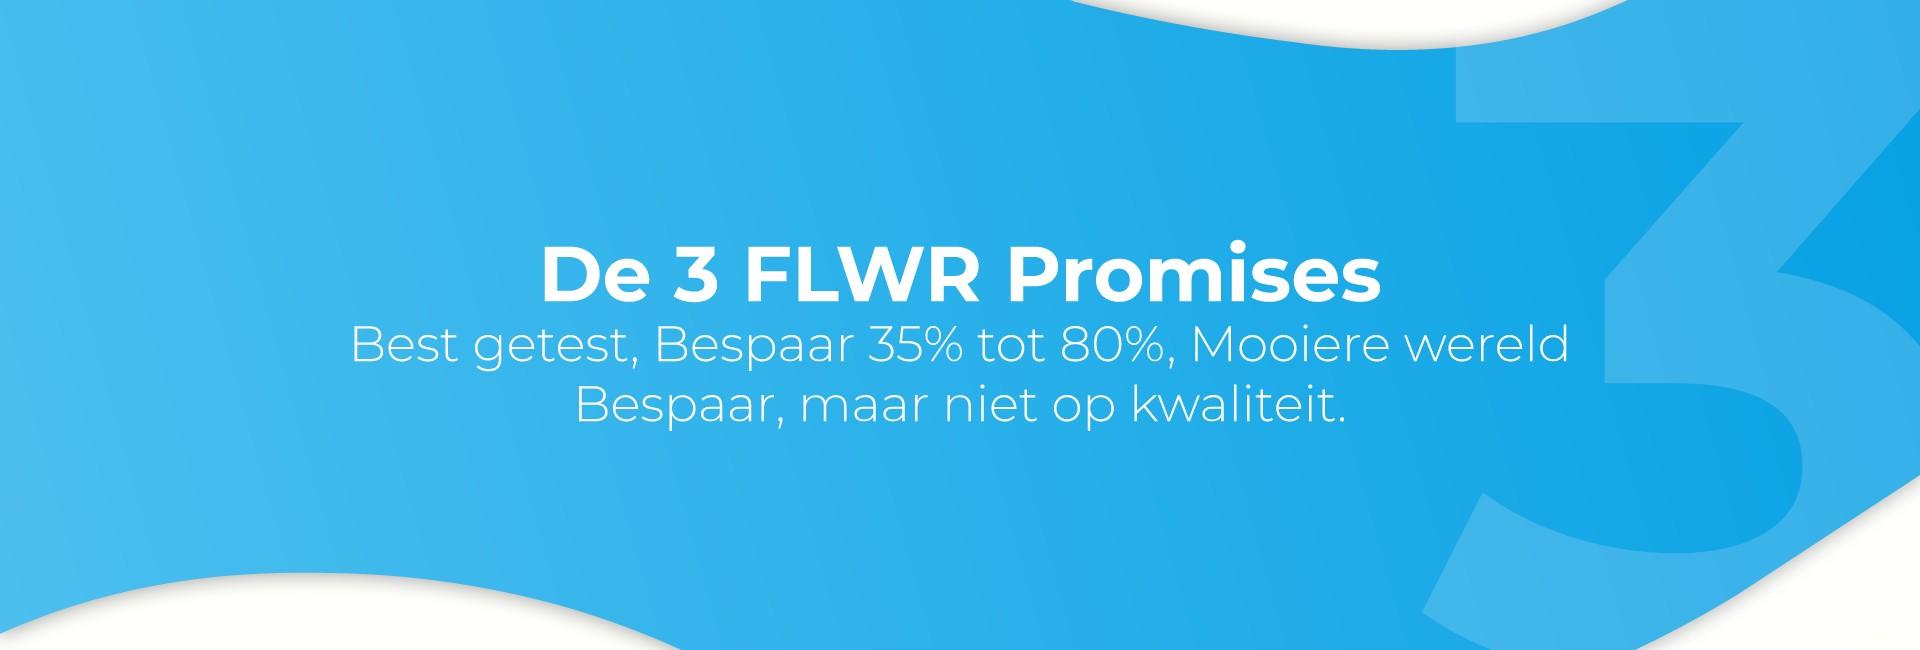 promises three